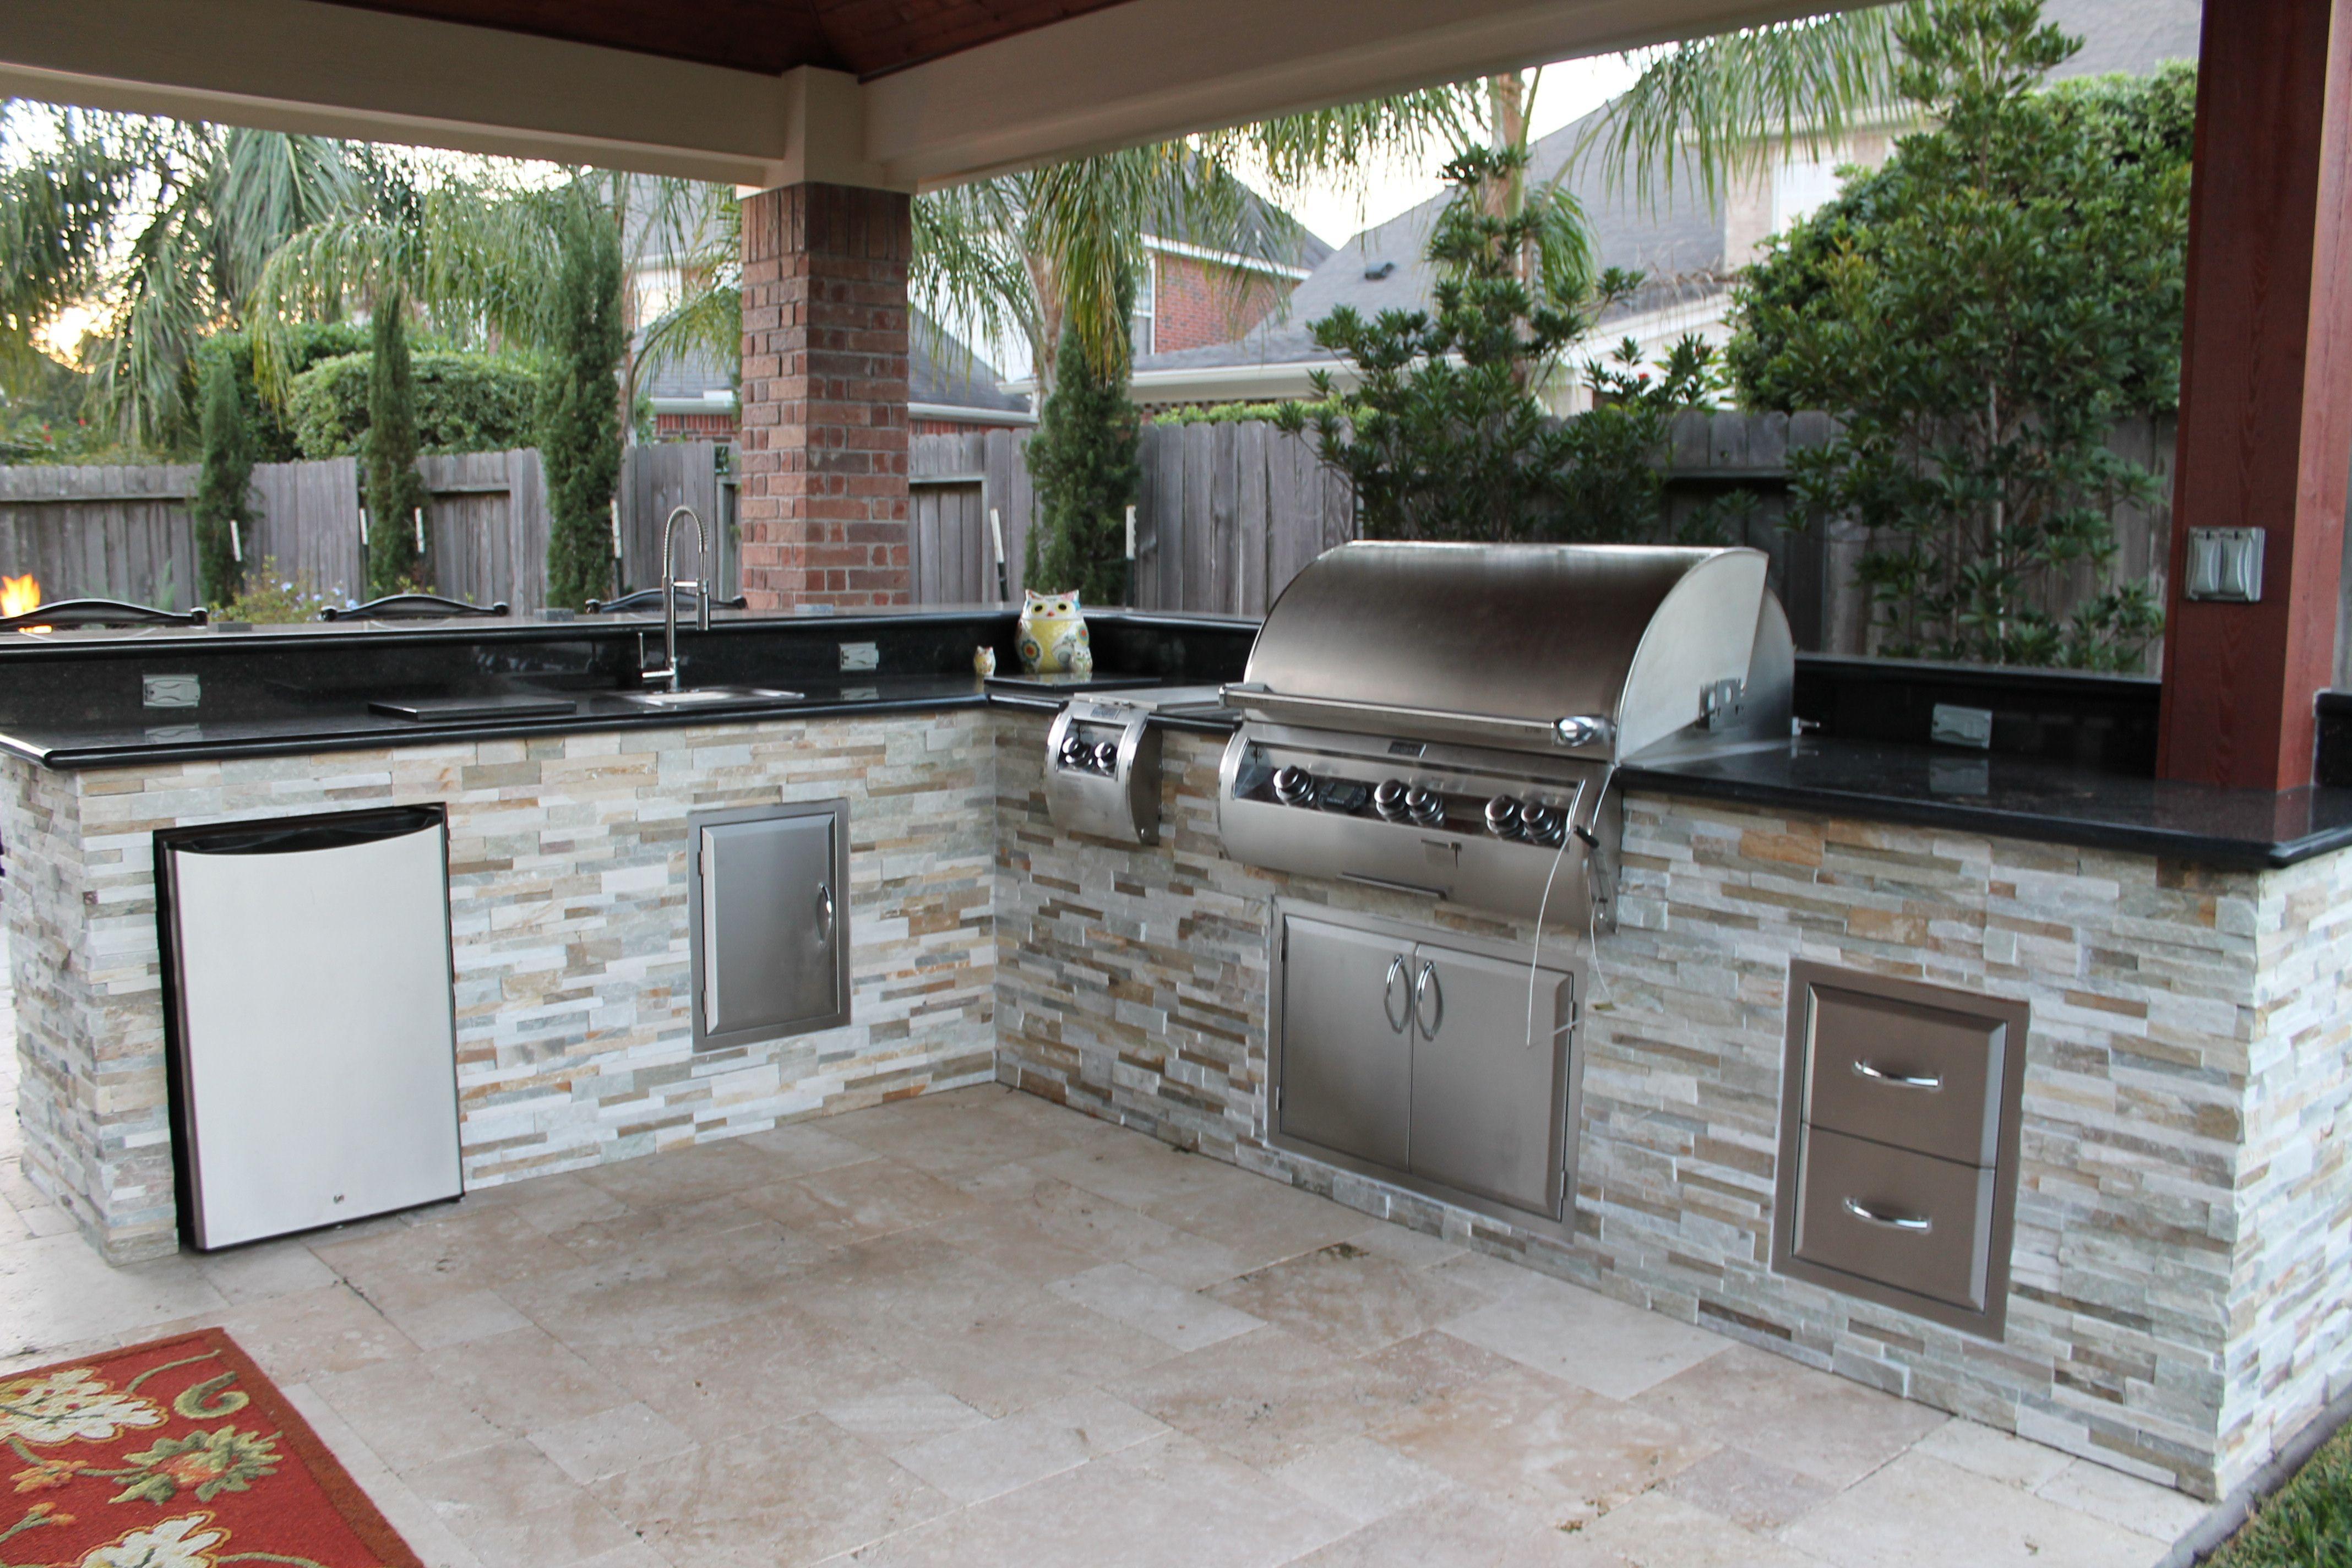 Wet Pools Inc Structure Katy Texas Outdoor Living Outdoor Kitchen Design Outdoor Kitchen